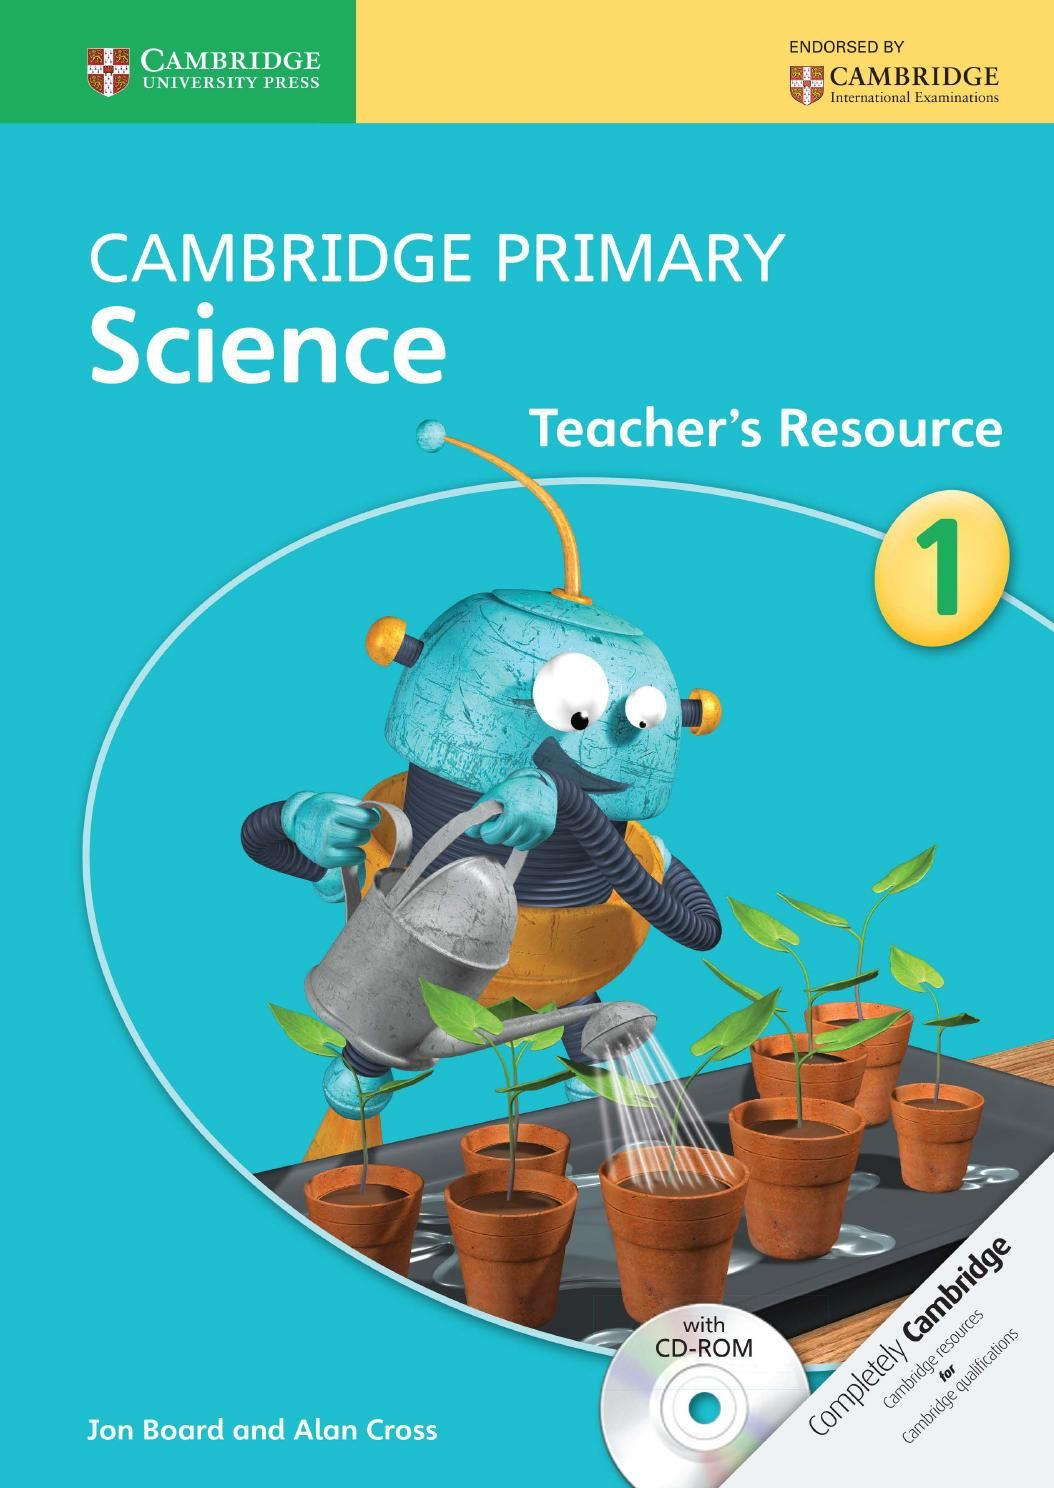 medium resolution of Cambridge Primary Science Teacher's Resource 1   Primary science